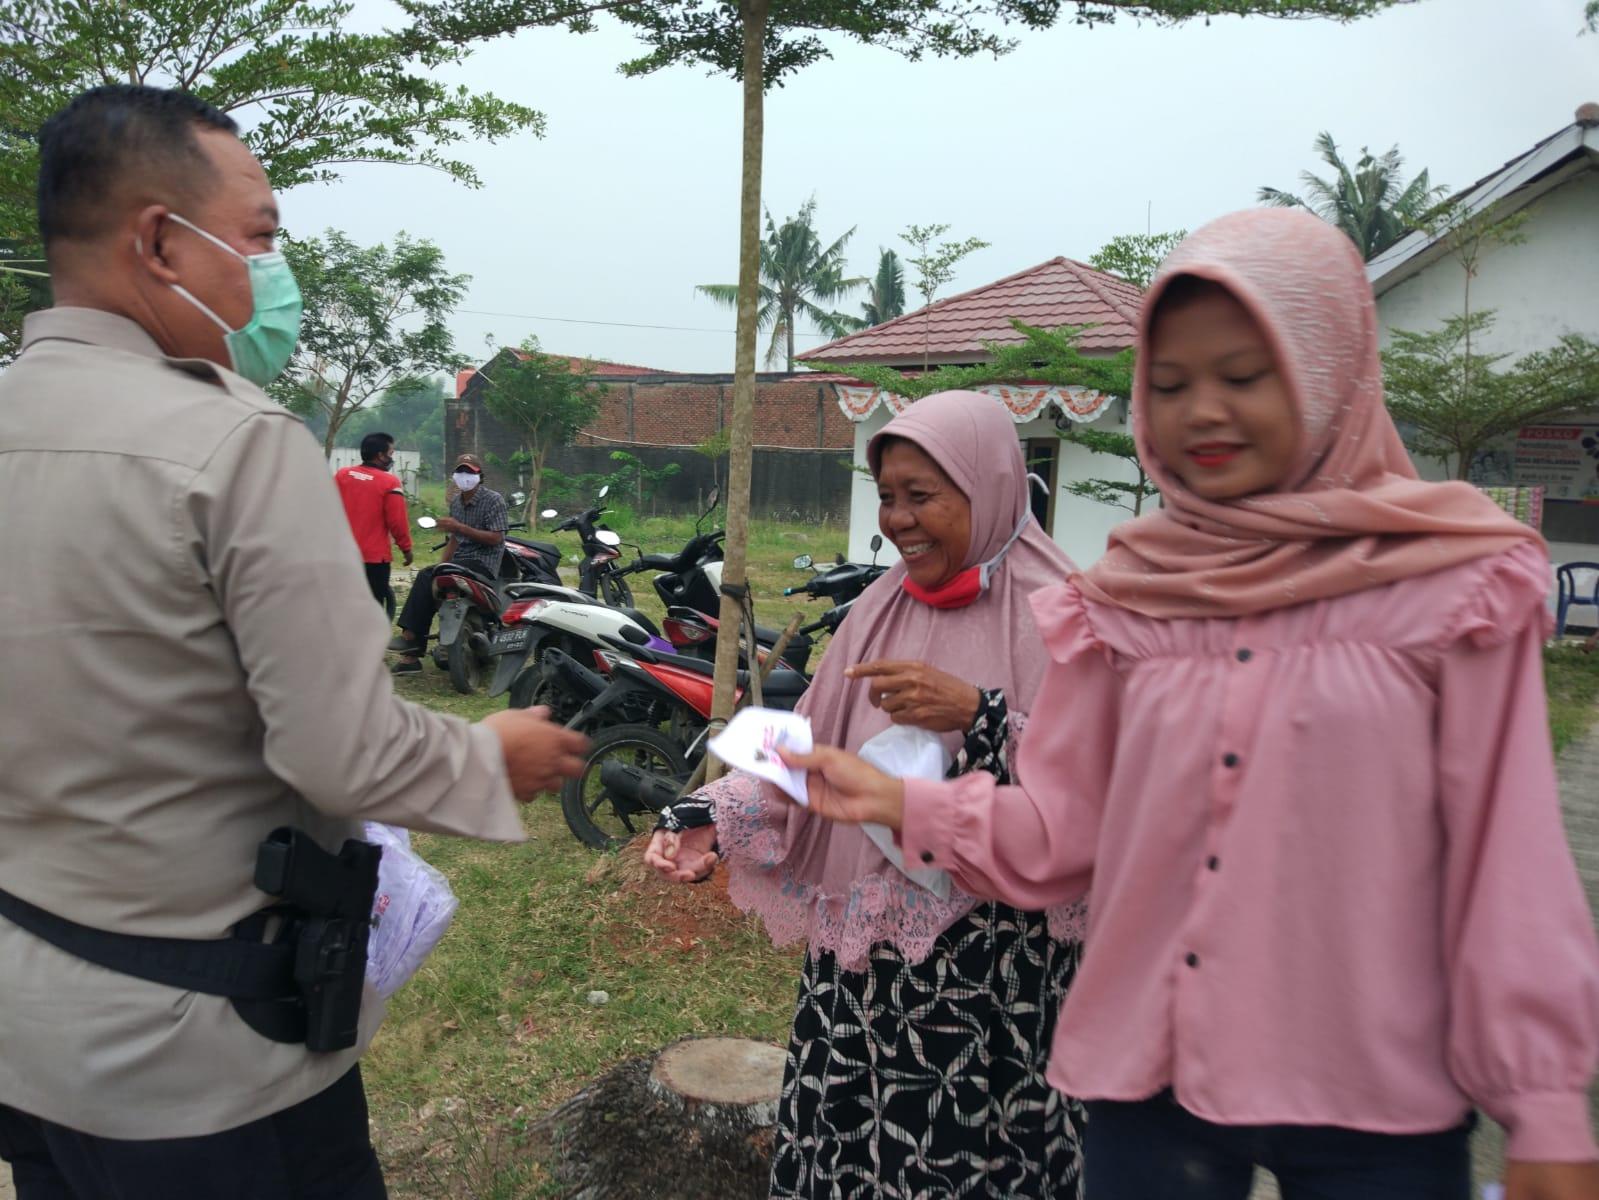 Polsek Cabangbungin Bekasi Bersama Muspika Menggelar Vaksinasi di 8 Desa